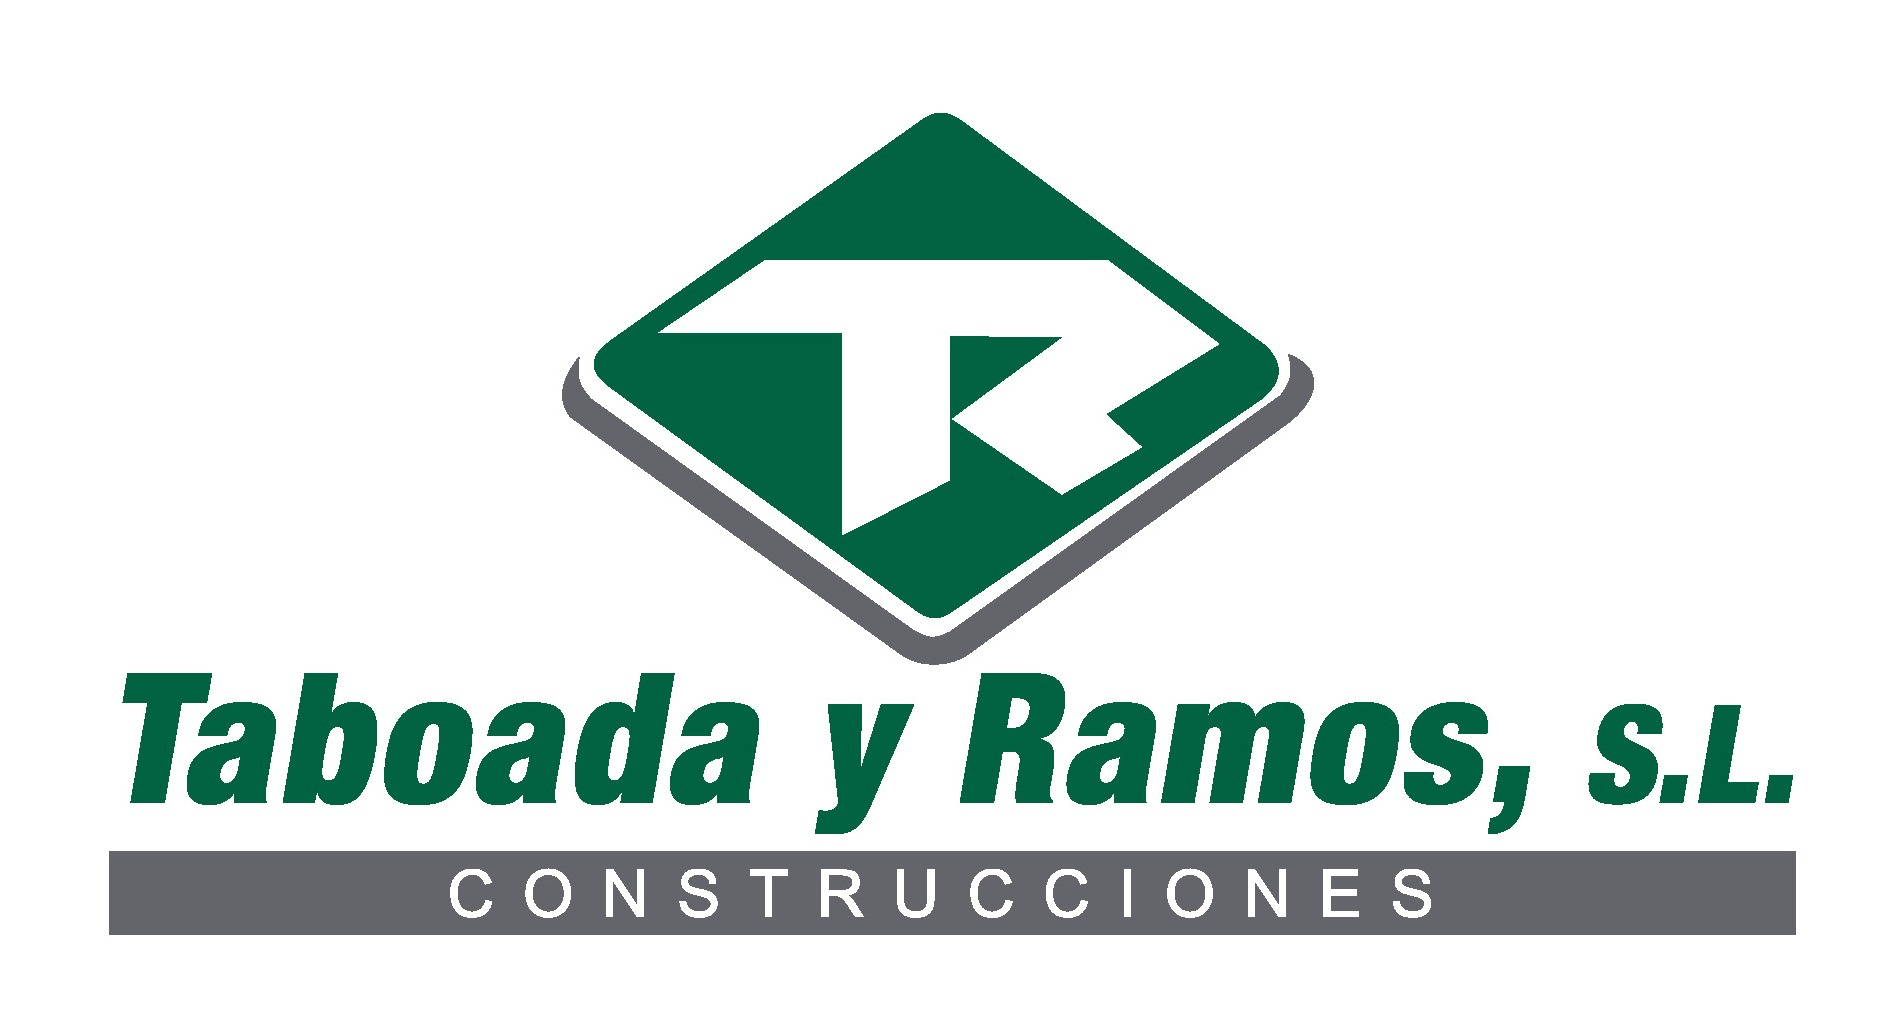 Logo Taboada y Ramos